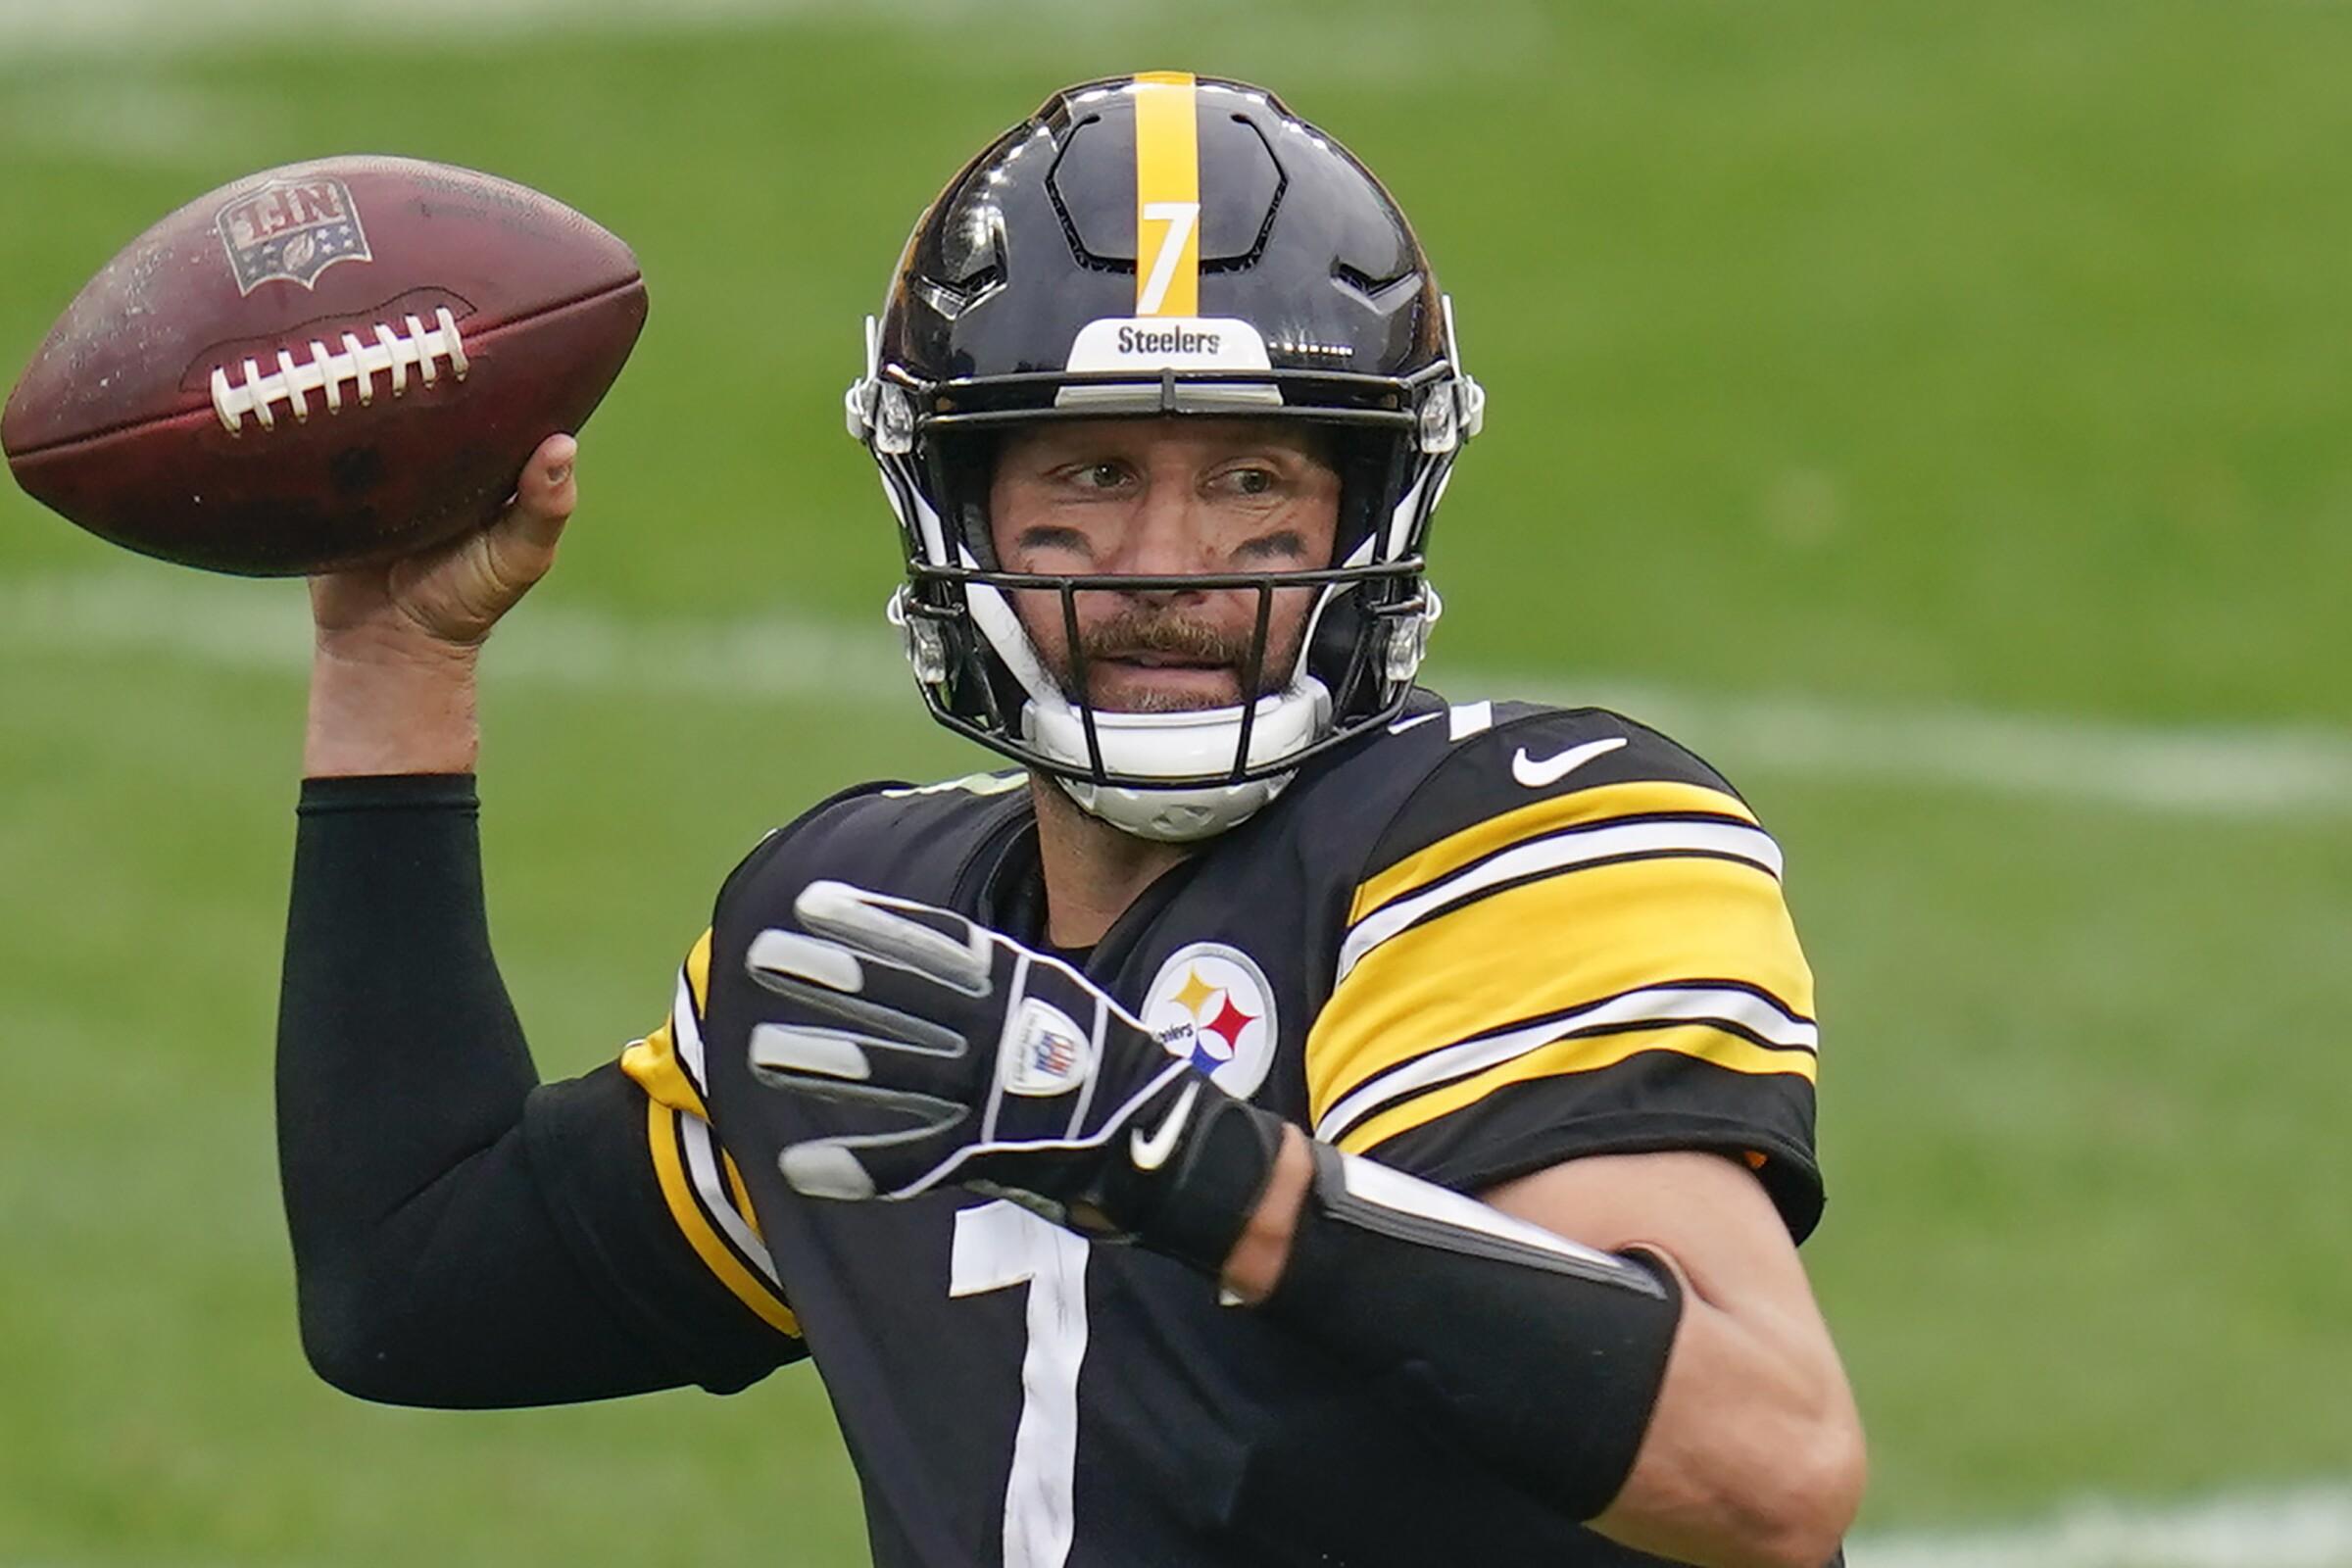 Pittsburgh Steelers quarterback Ben Roethlisberger passes against the Philadelphia Eagles.